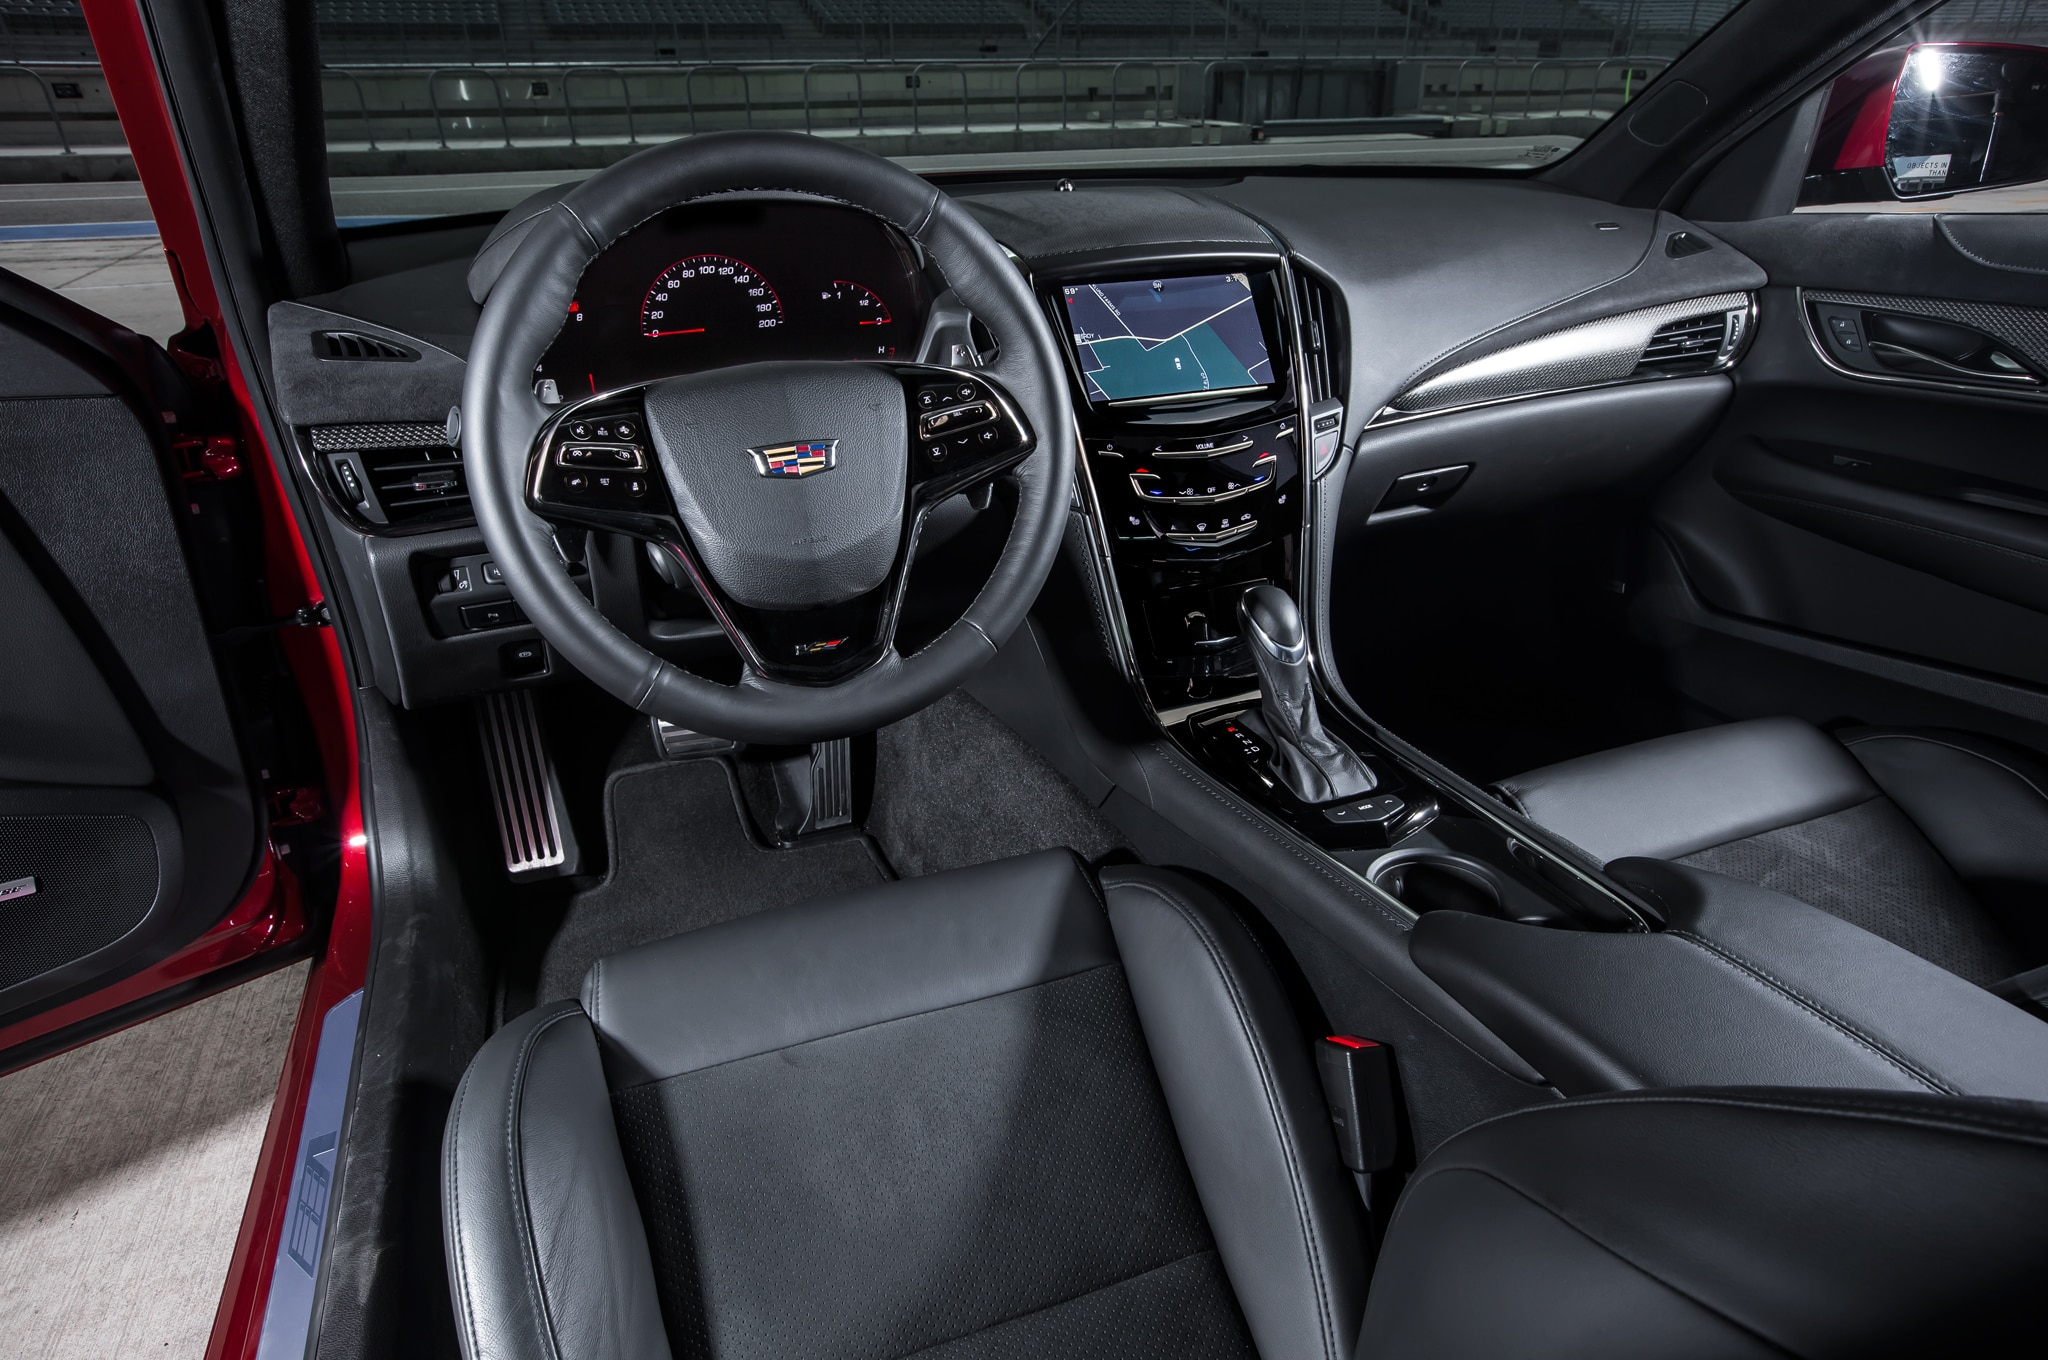 2016 Cadillac ATS-V interior